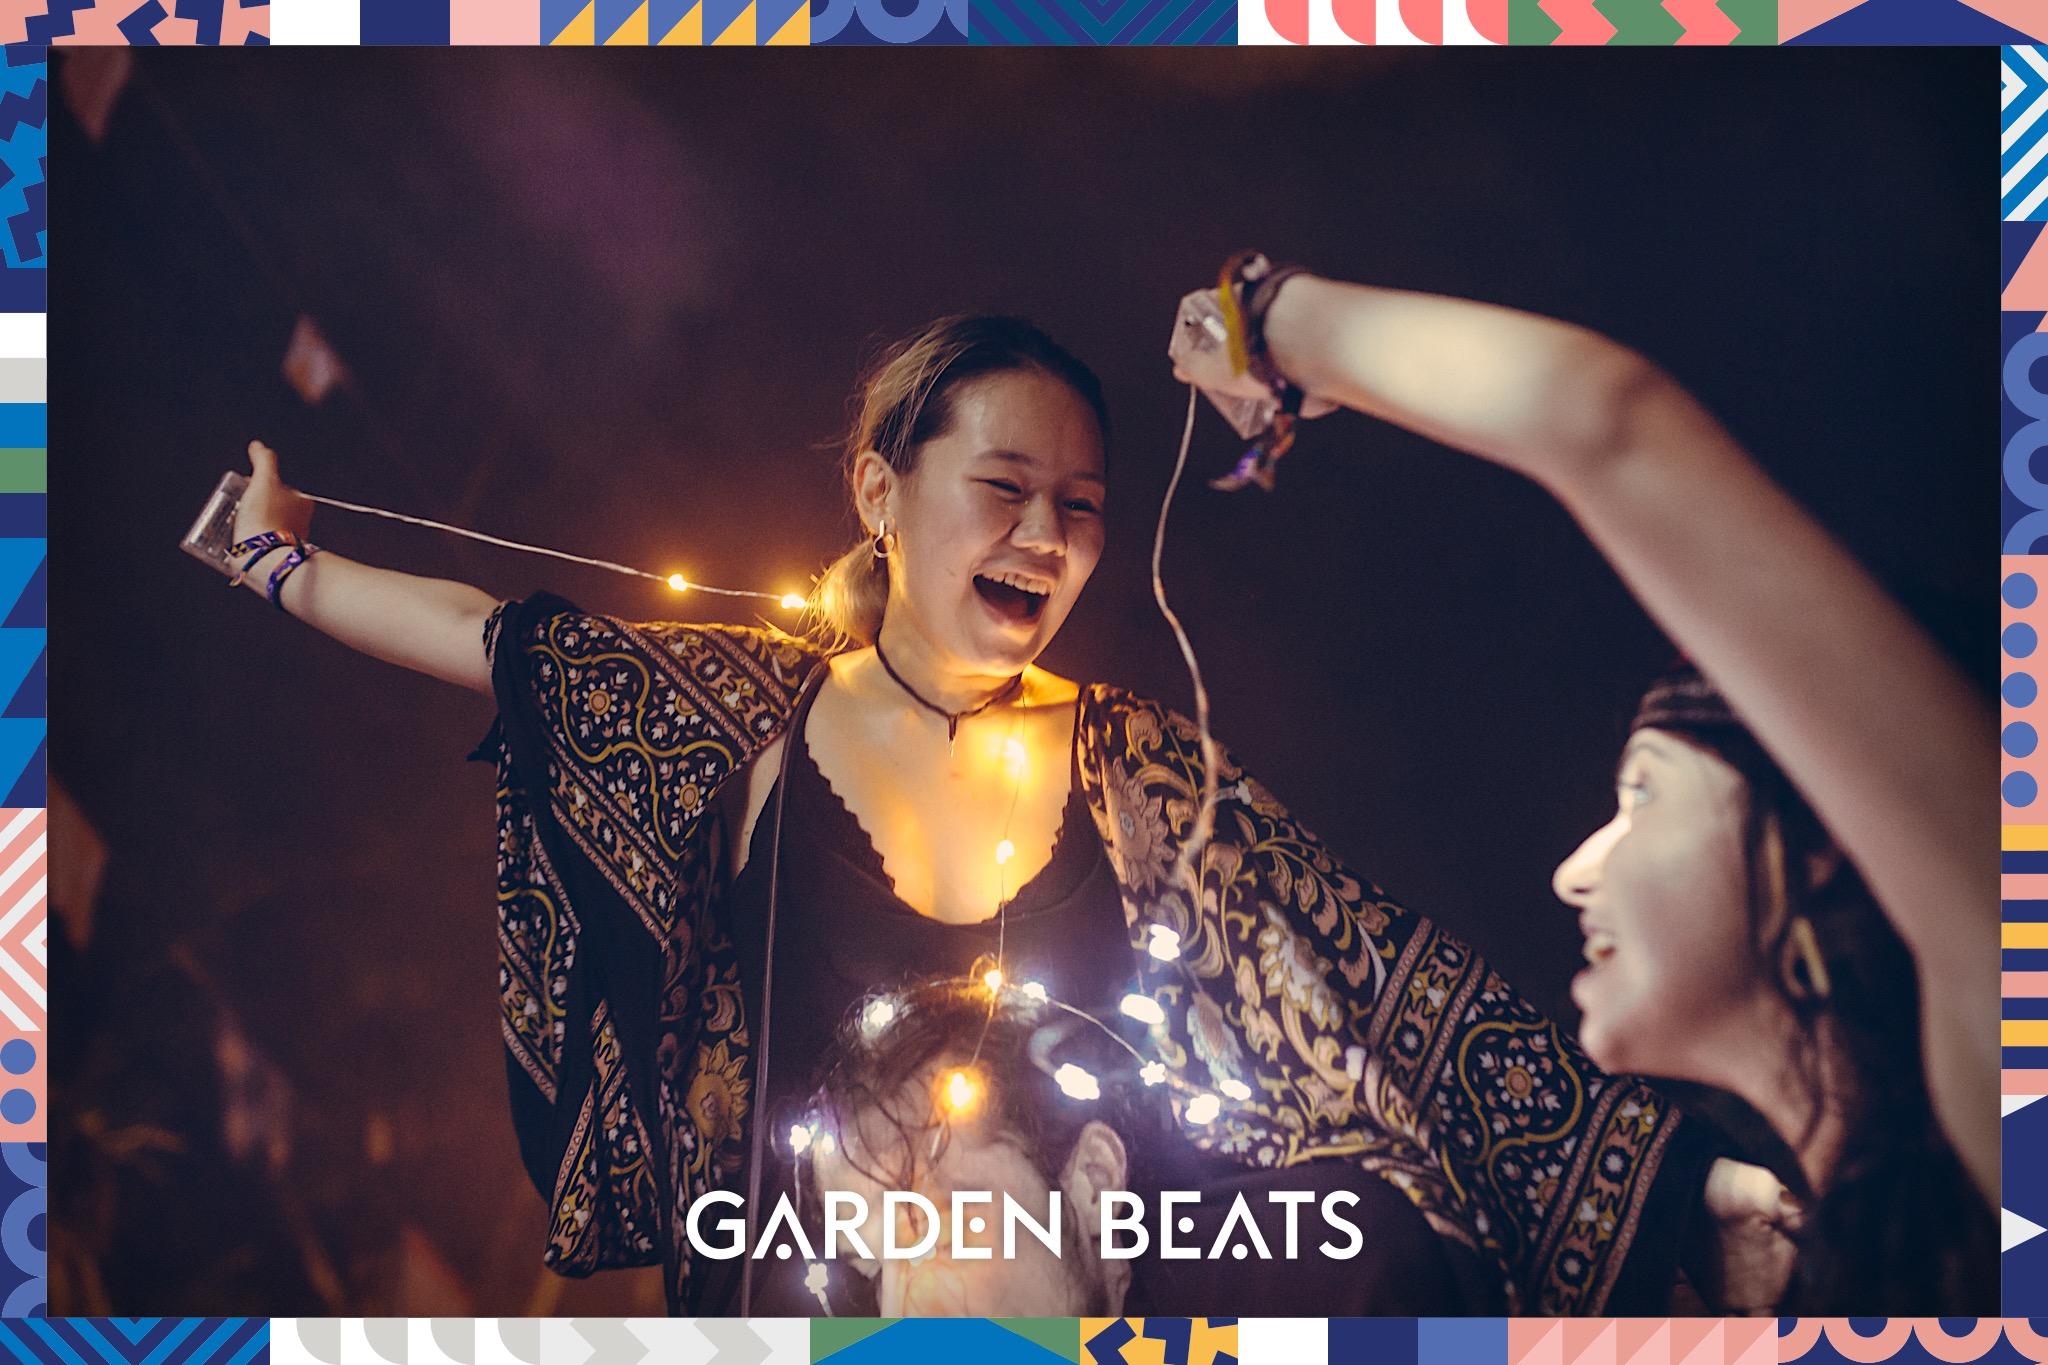 18032017_GardenBeats_Colossal896_WatermarkedGB.jpg